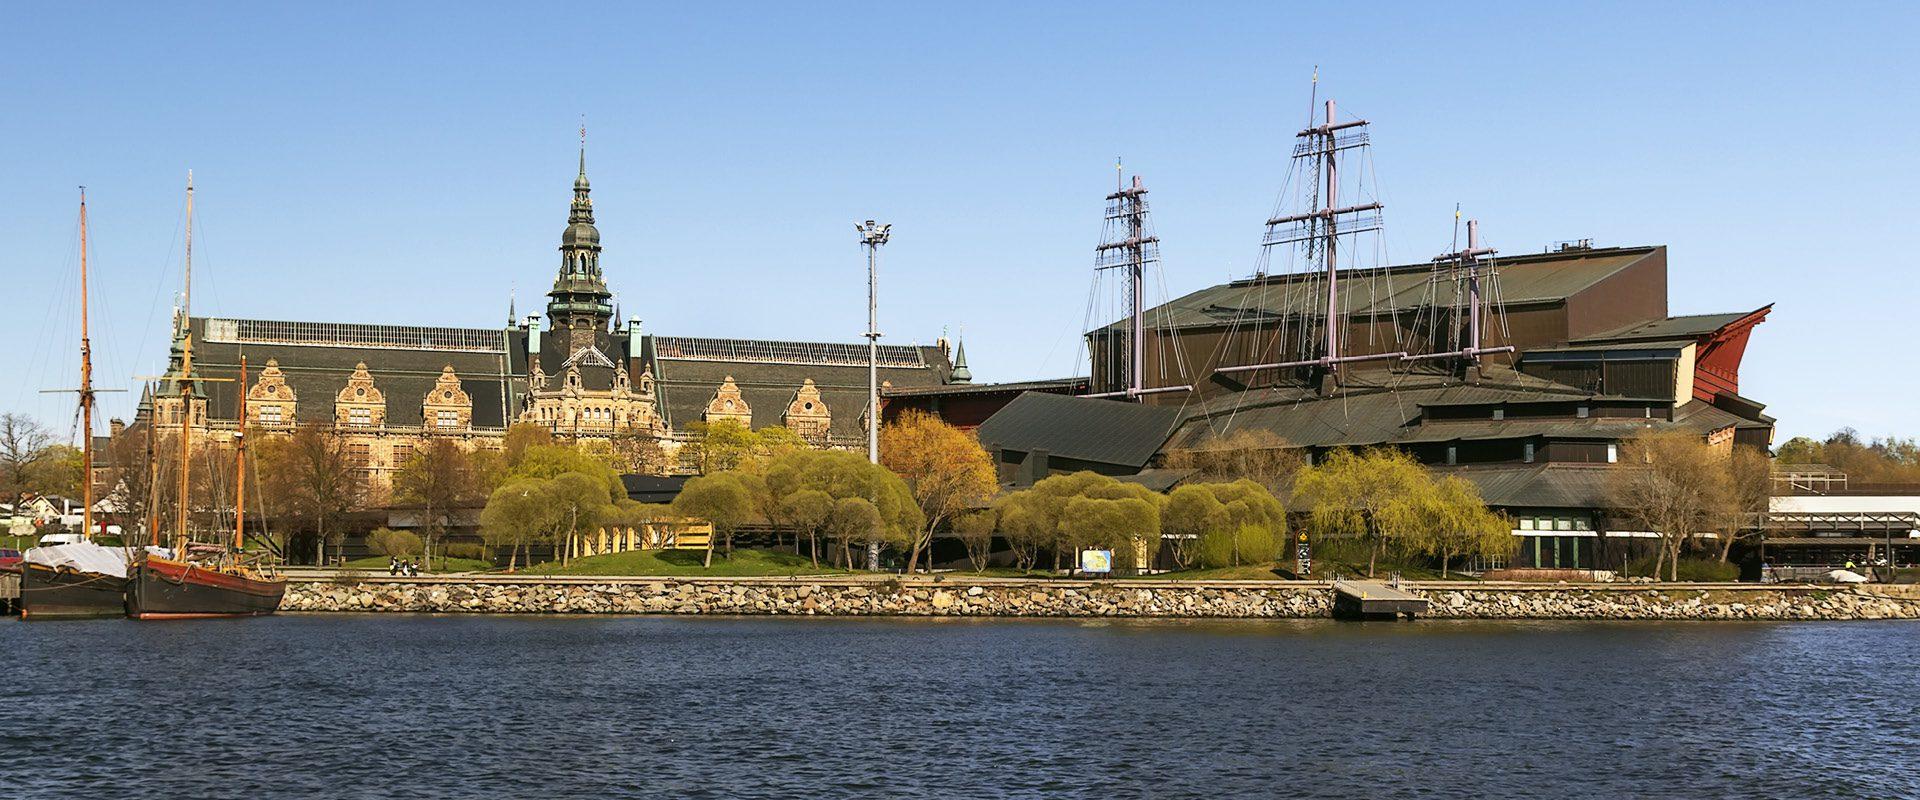 Vasa - Viajeros con B - Estocolmo